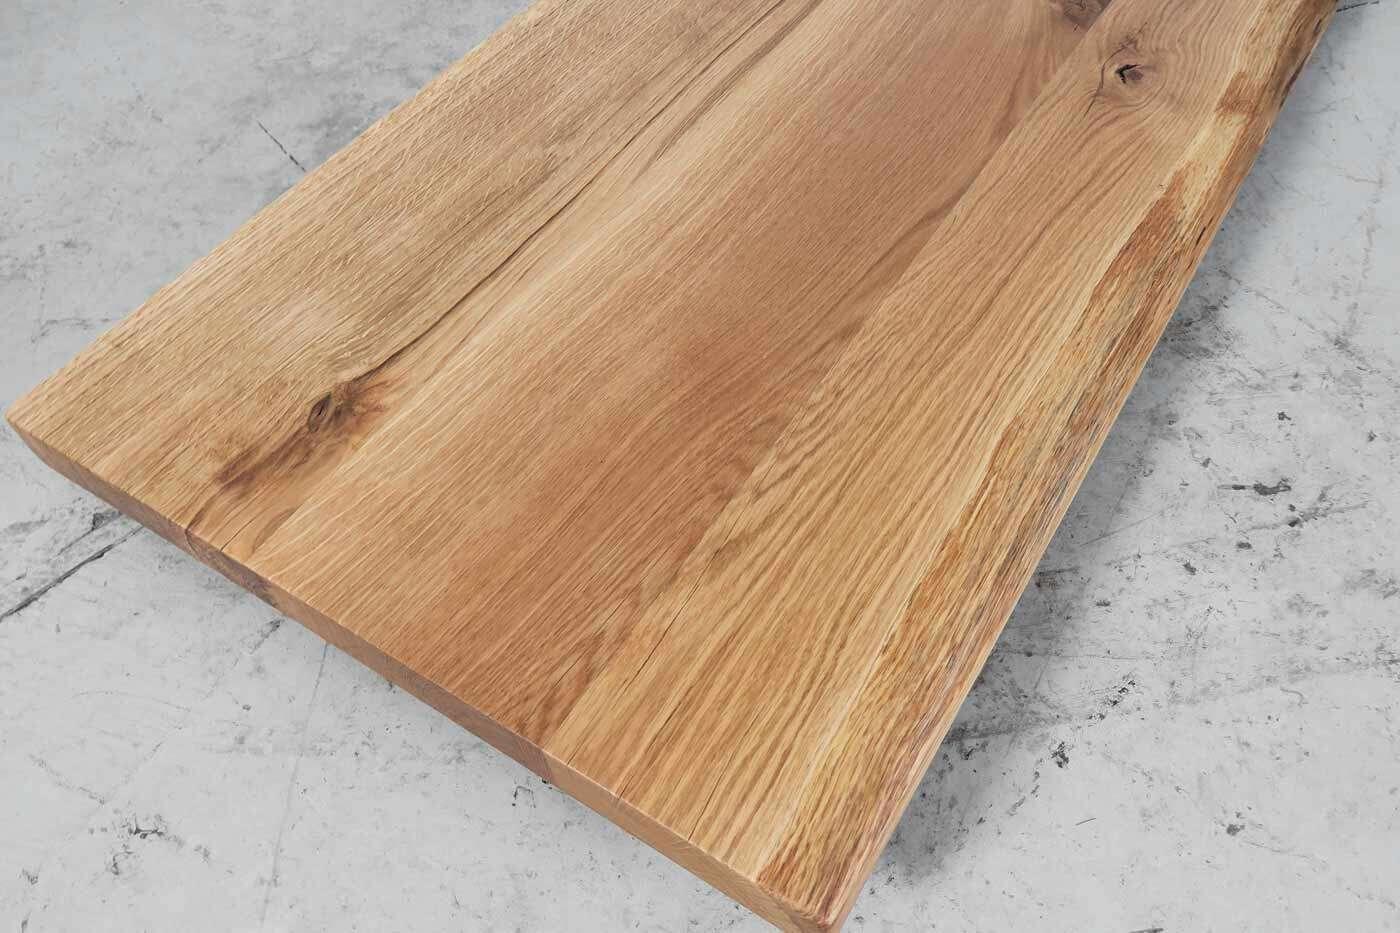 massivholz waschtischplatte eiche 140x50cm. Black Bedroom Furniture Sets. Home Design Ideas